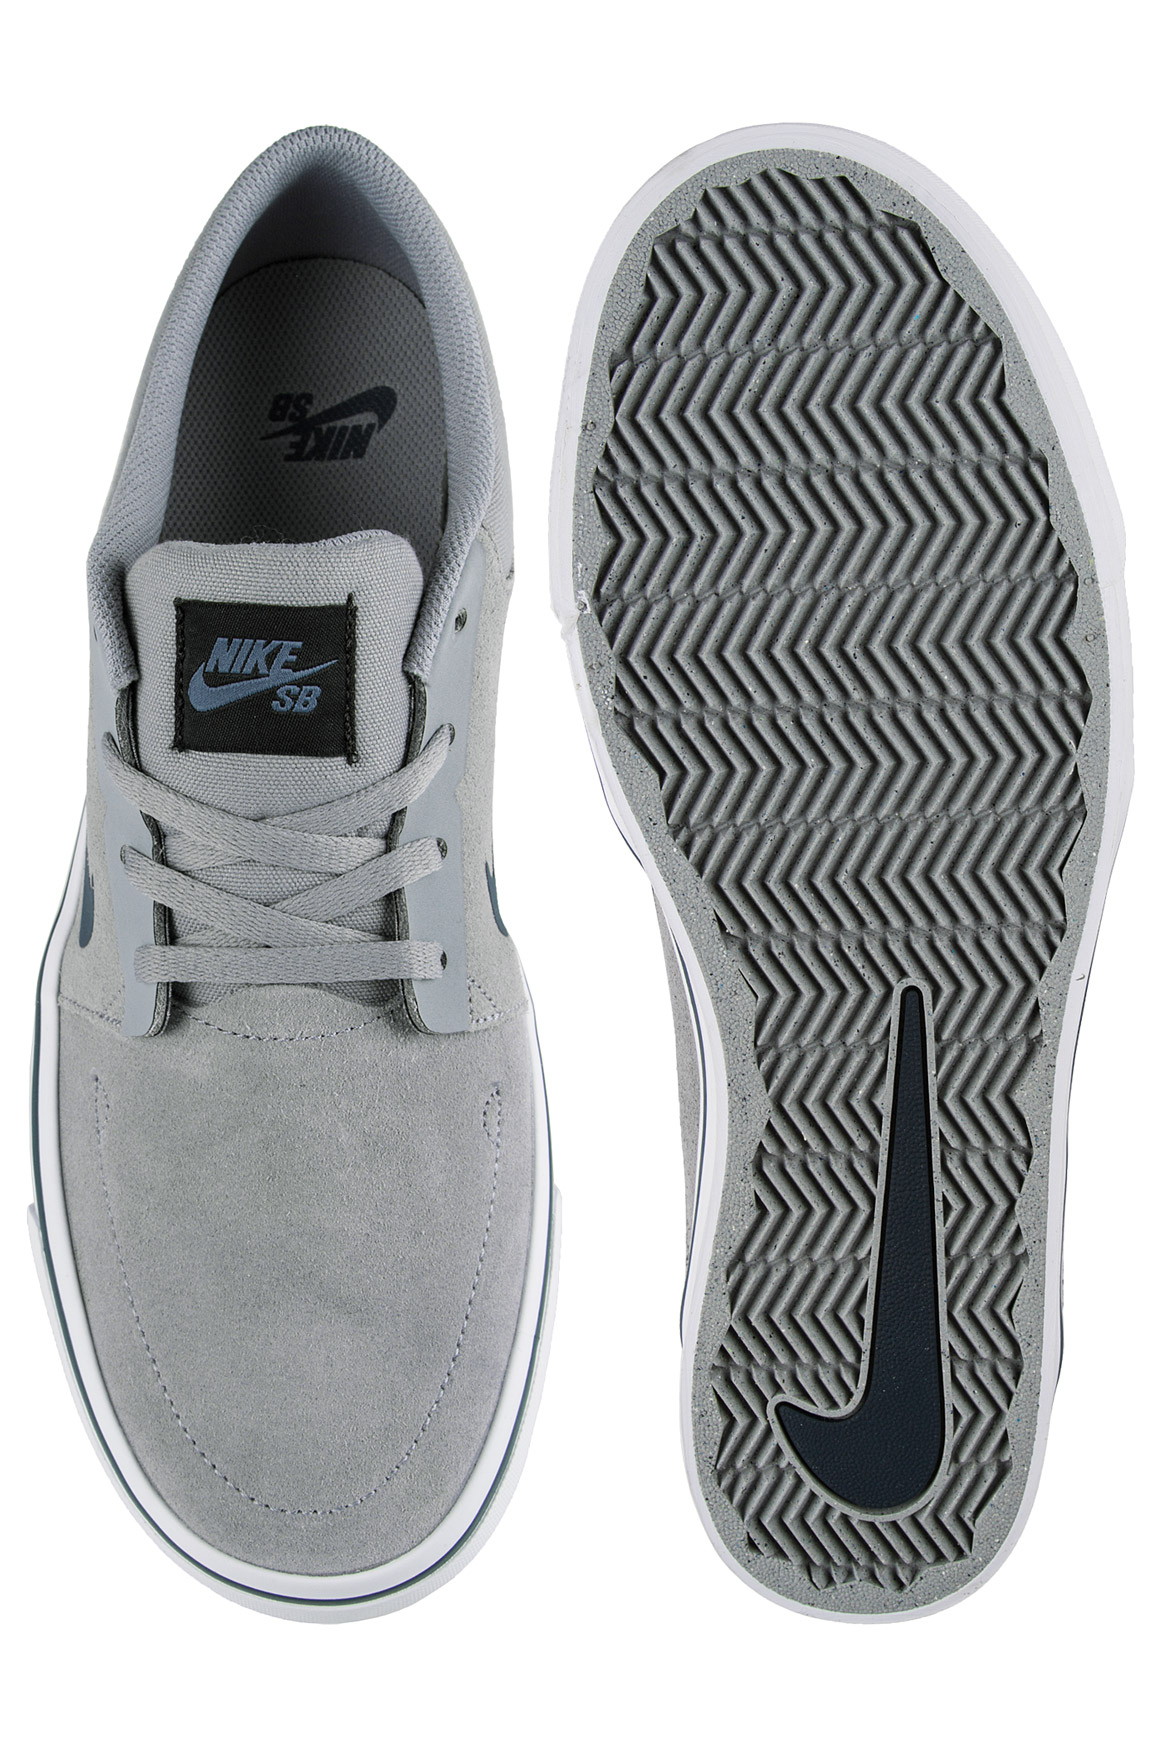 nike sb portmore chaussure grey squadron blue achetez sur skatedeluxe. Black Bedroom Furniture Sets. Home Design Ideas